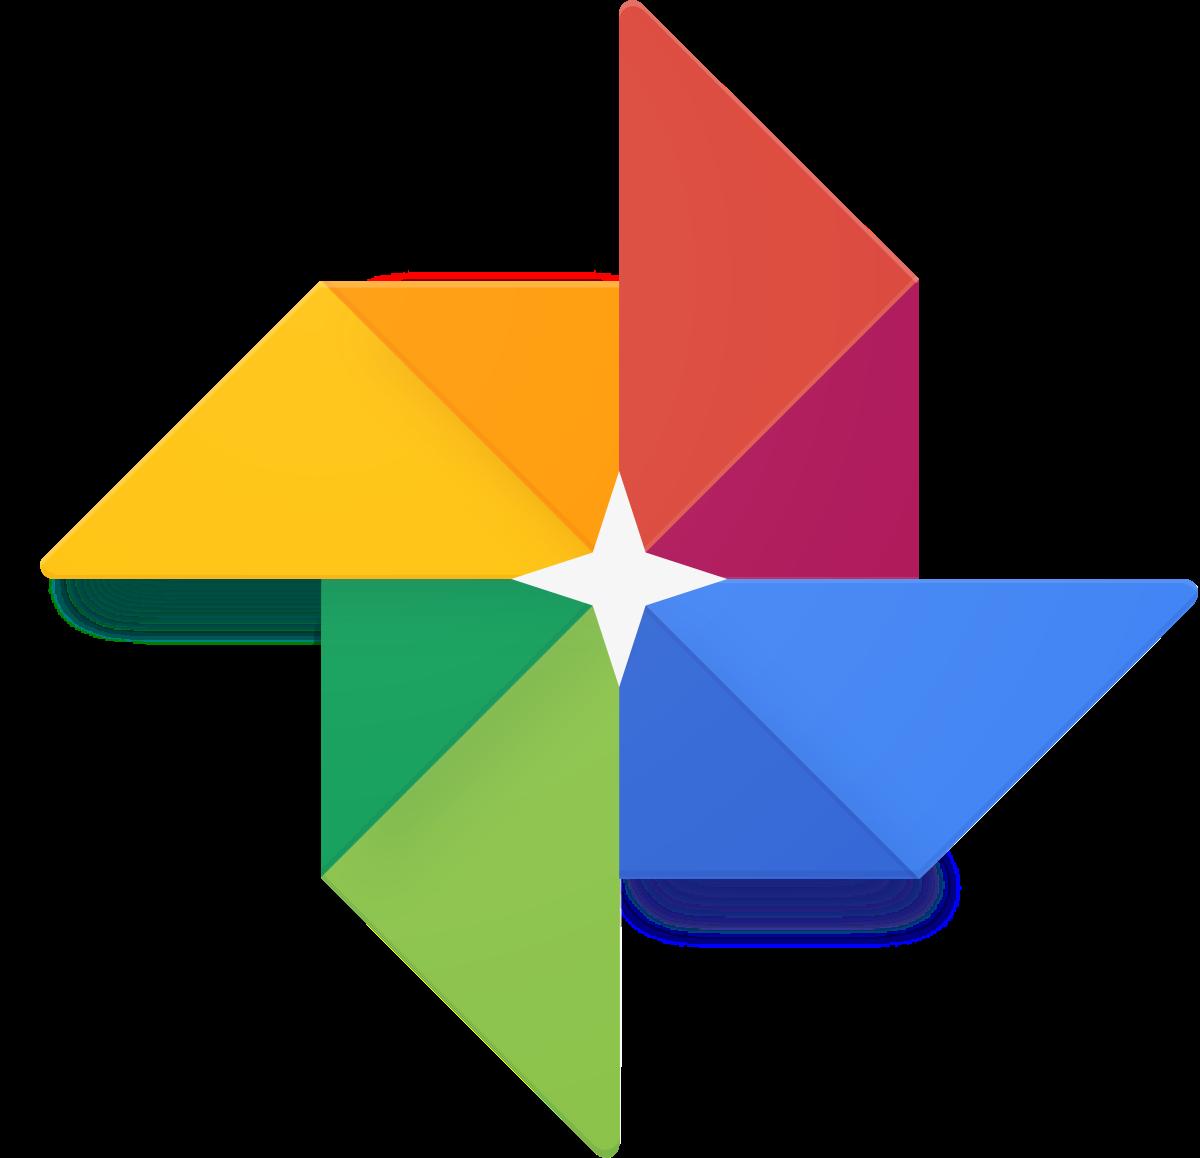 Google Photos Microsoft Photos نرمافزار اپلیکیشن گوگل